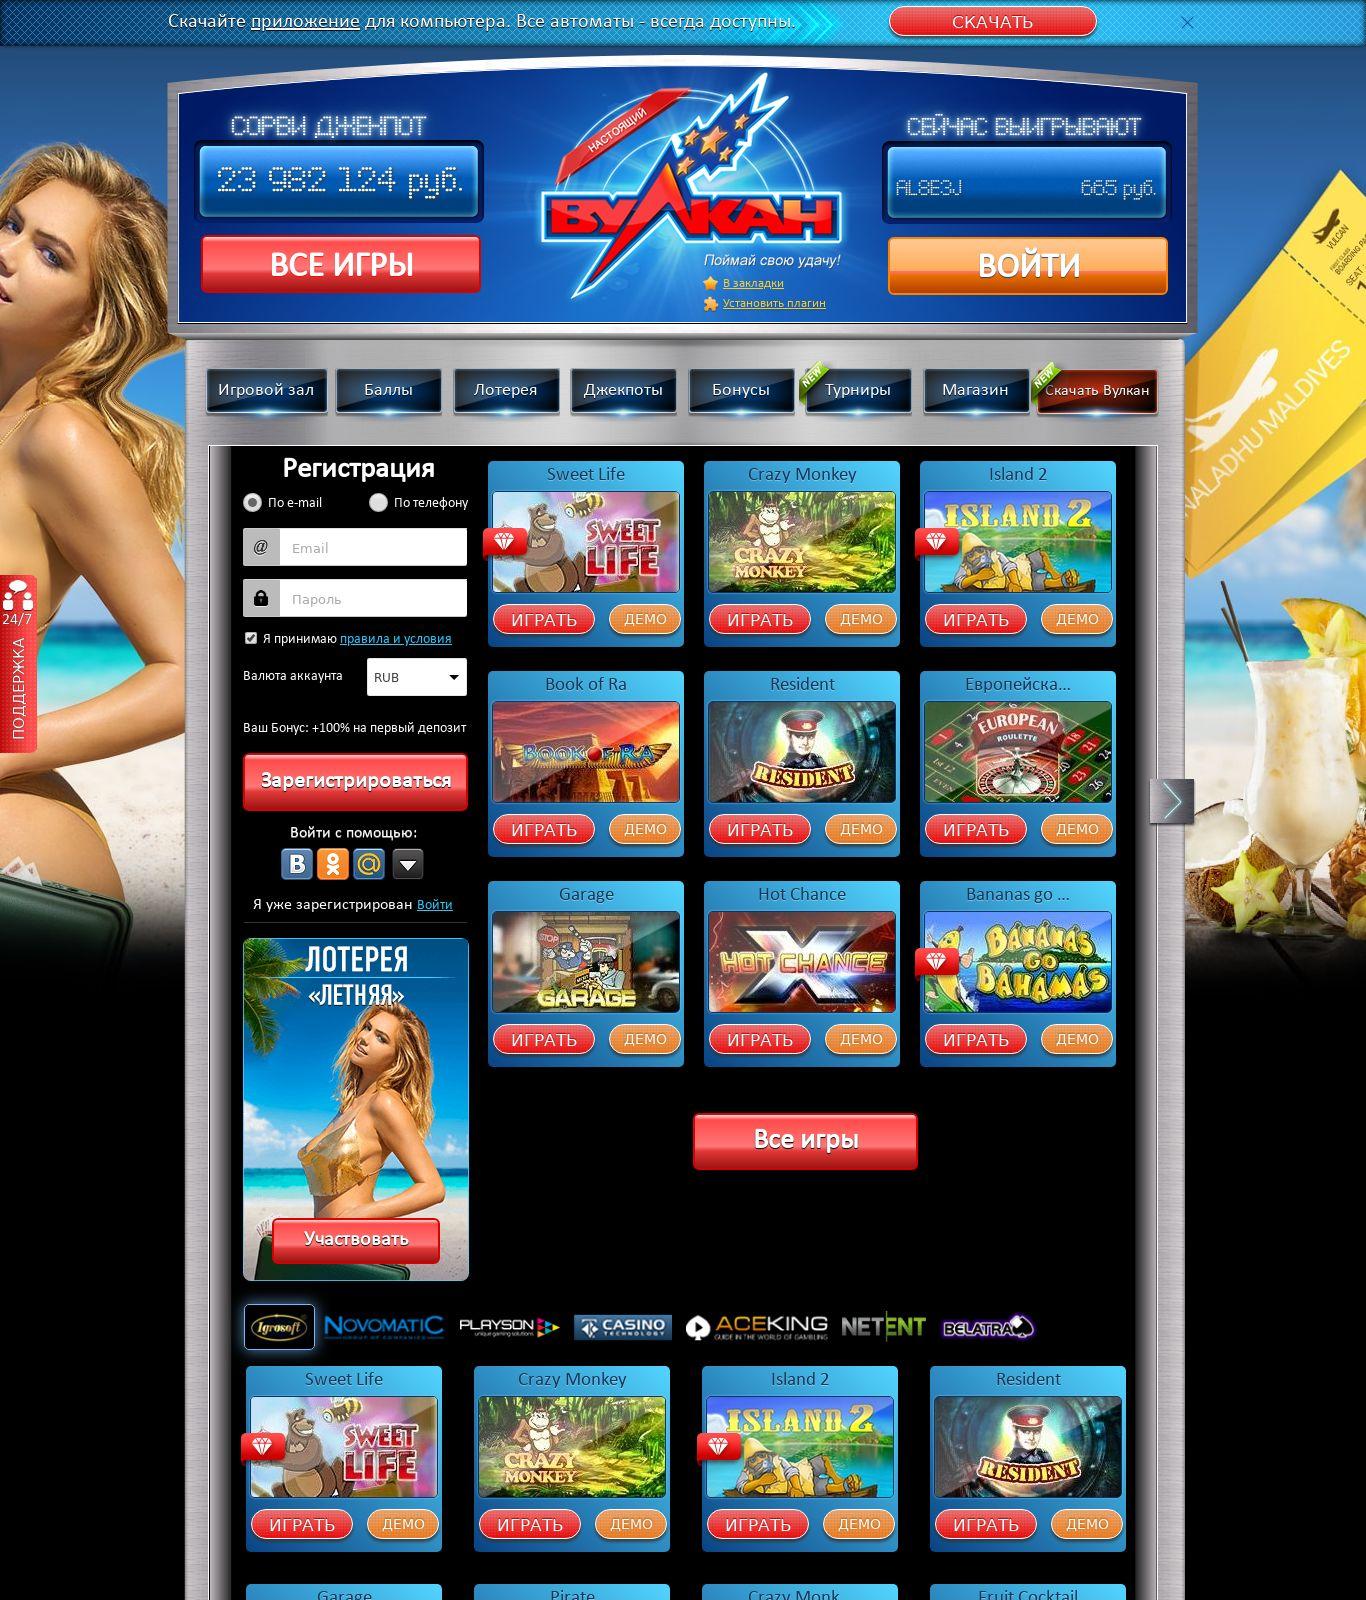 Vulcan betting advice website rule 10b 5 aiding and abetting fraud